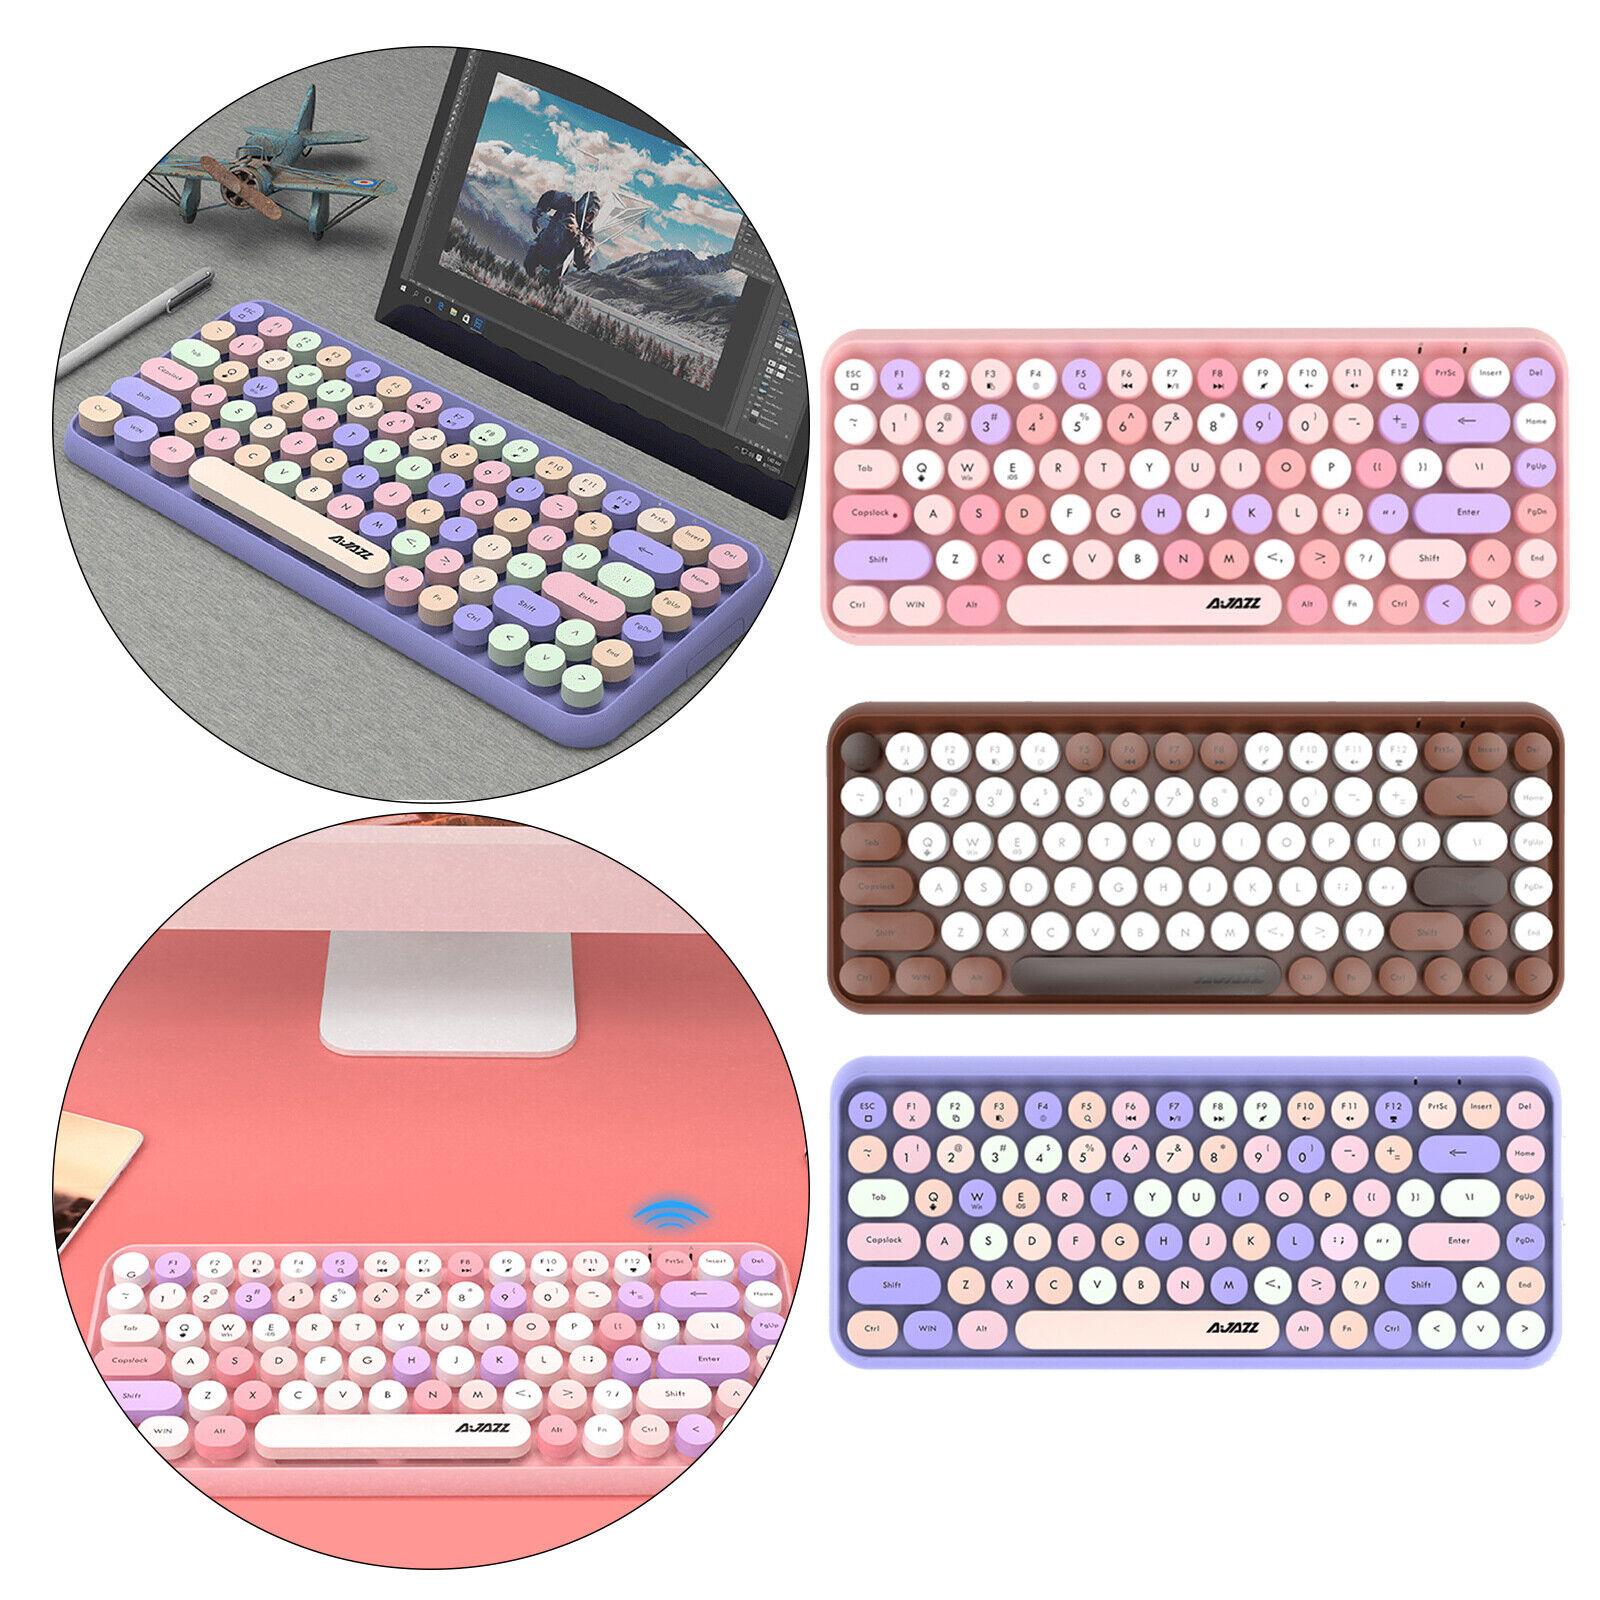 Mini 84-Key Round Keycaps Wireless Bluetooth Keyboard Portable Durable